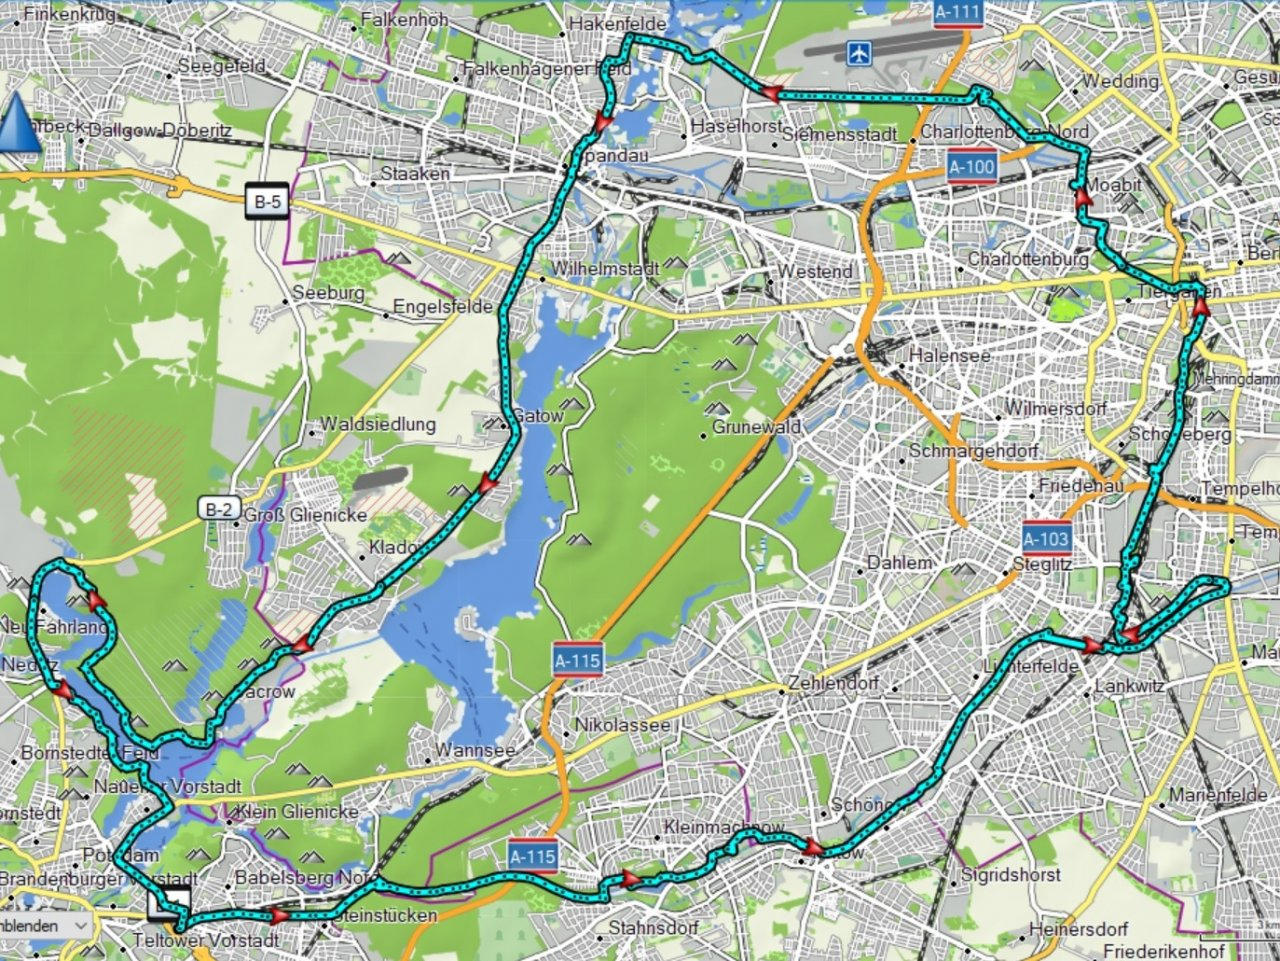 ped-fo 2020-09-21 TempelhofHafen-Moabit-Spandau 88km.jpg